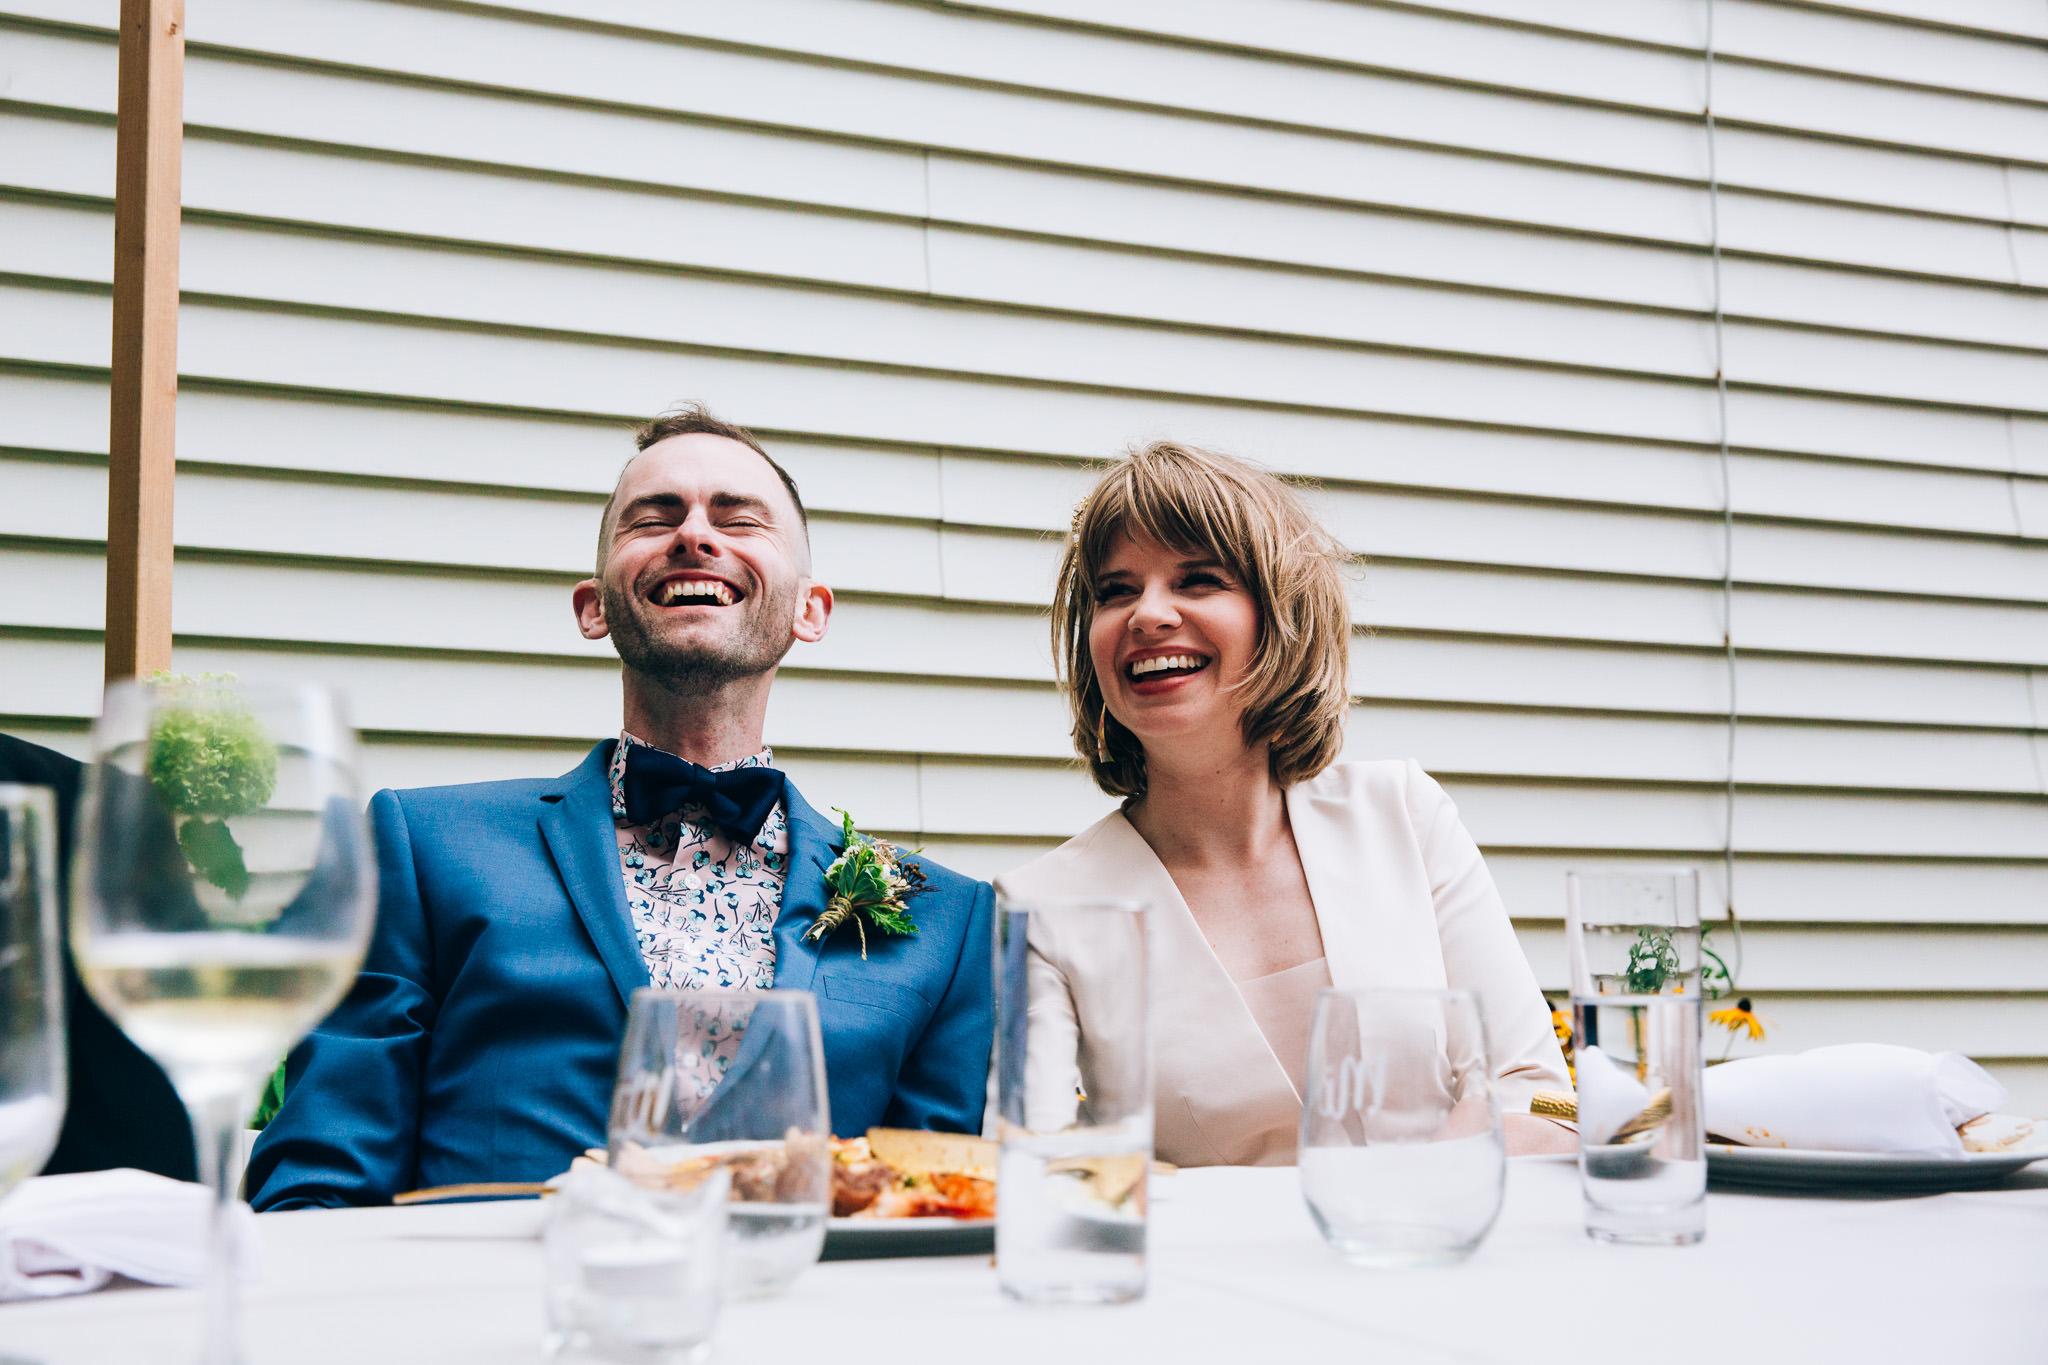 068_Canada-documentary-wedding-photograp